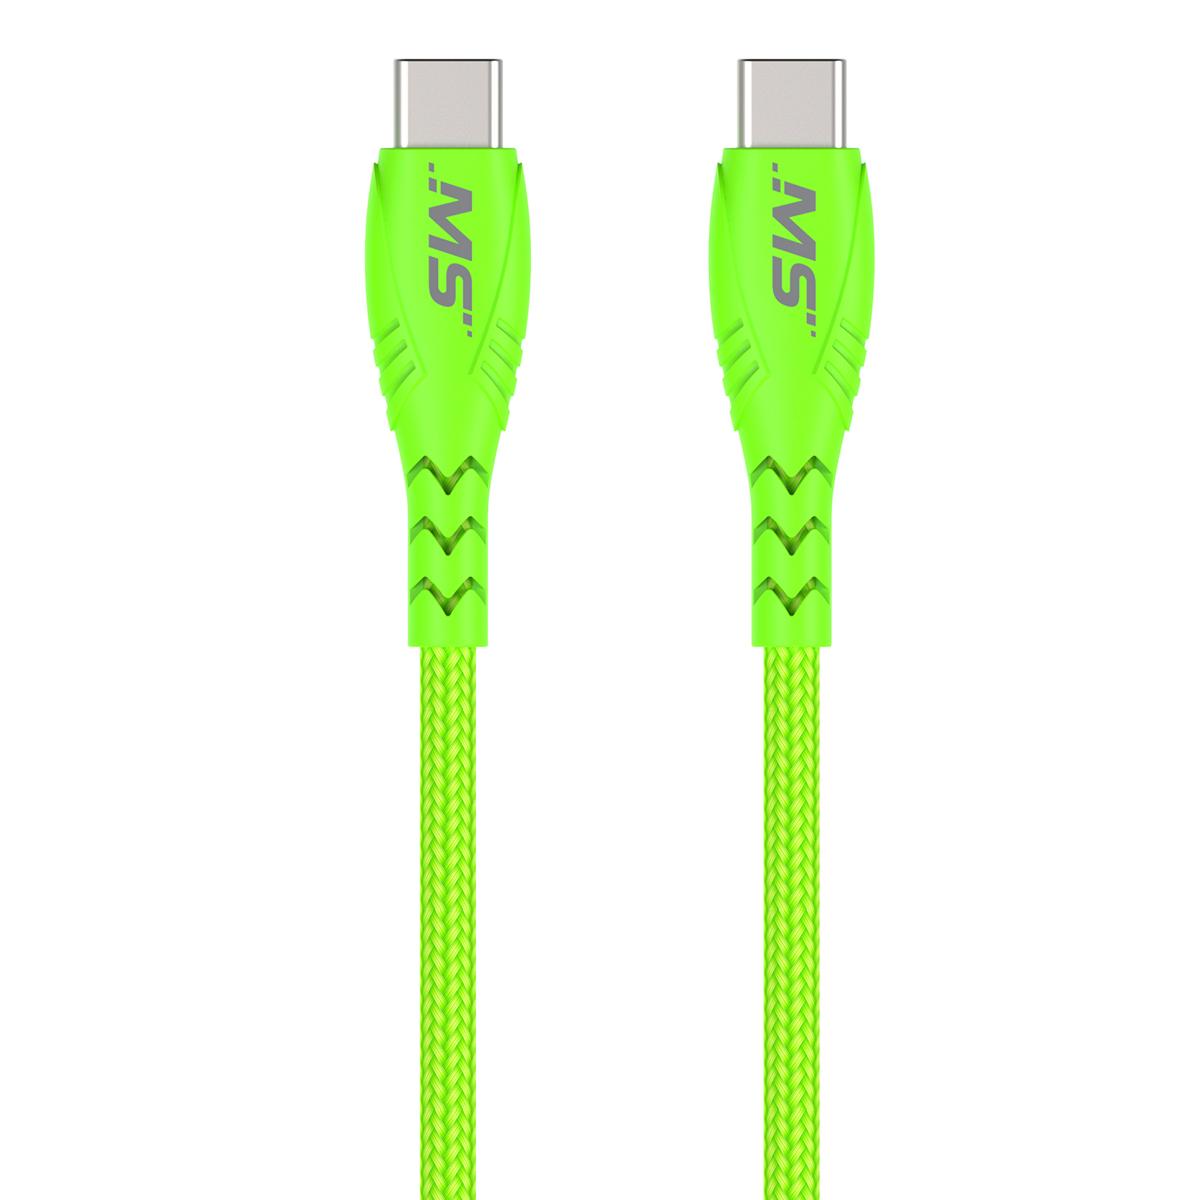 MS 10 HI VIS USB-C TO USB-C CABLE GR